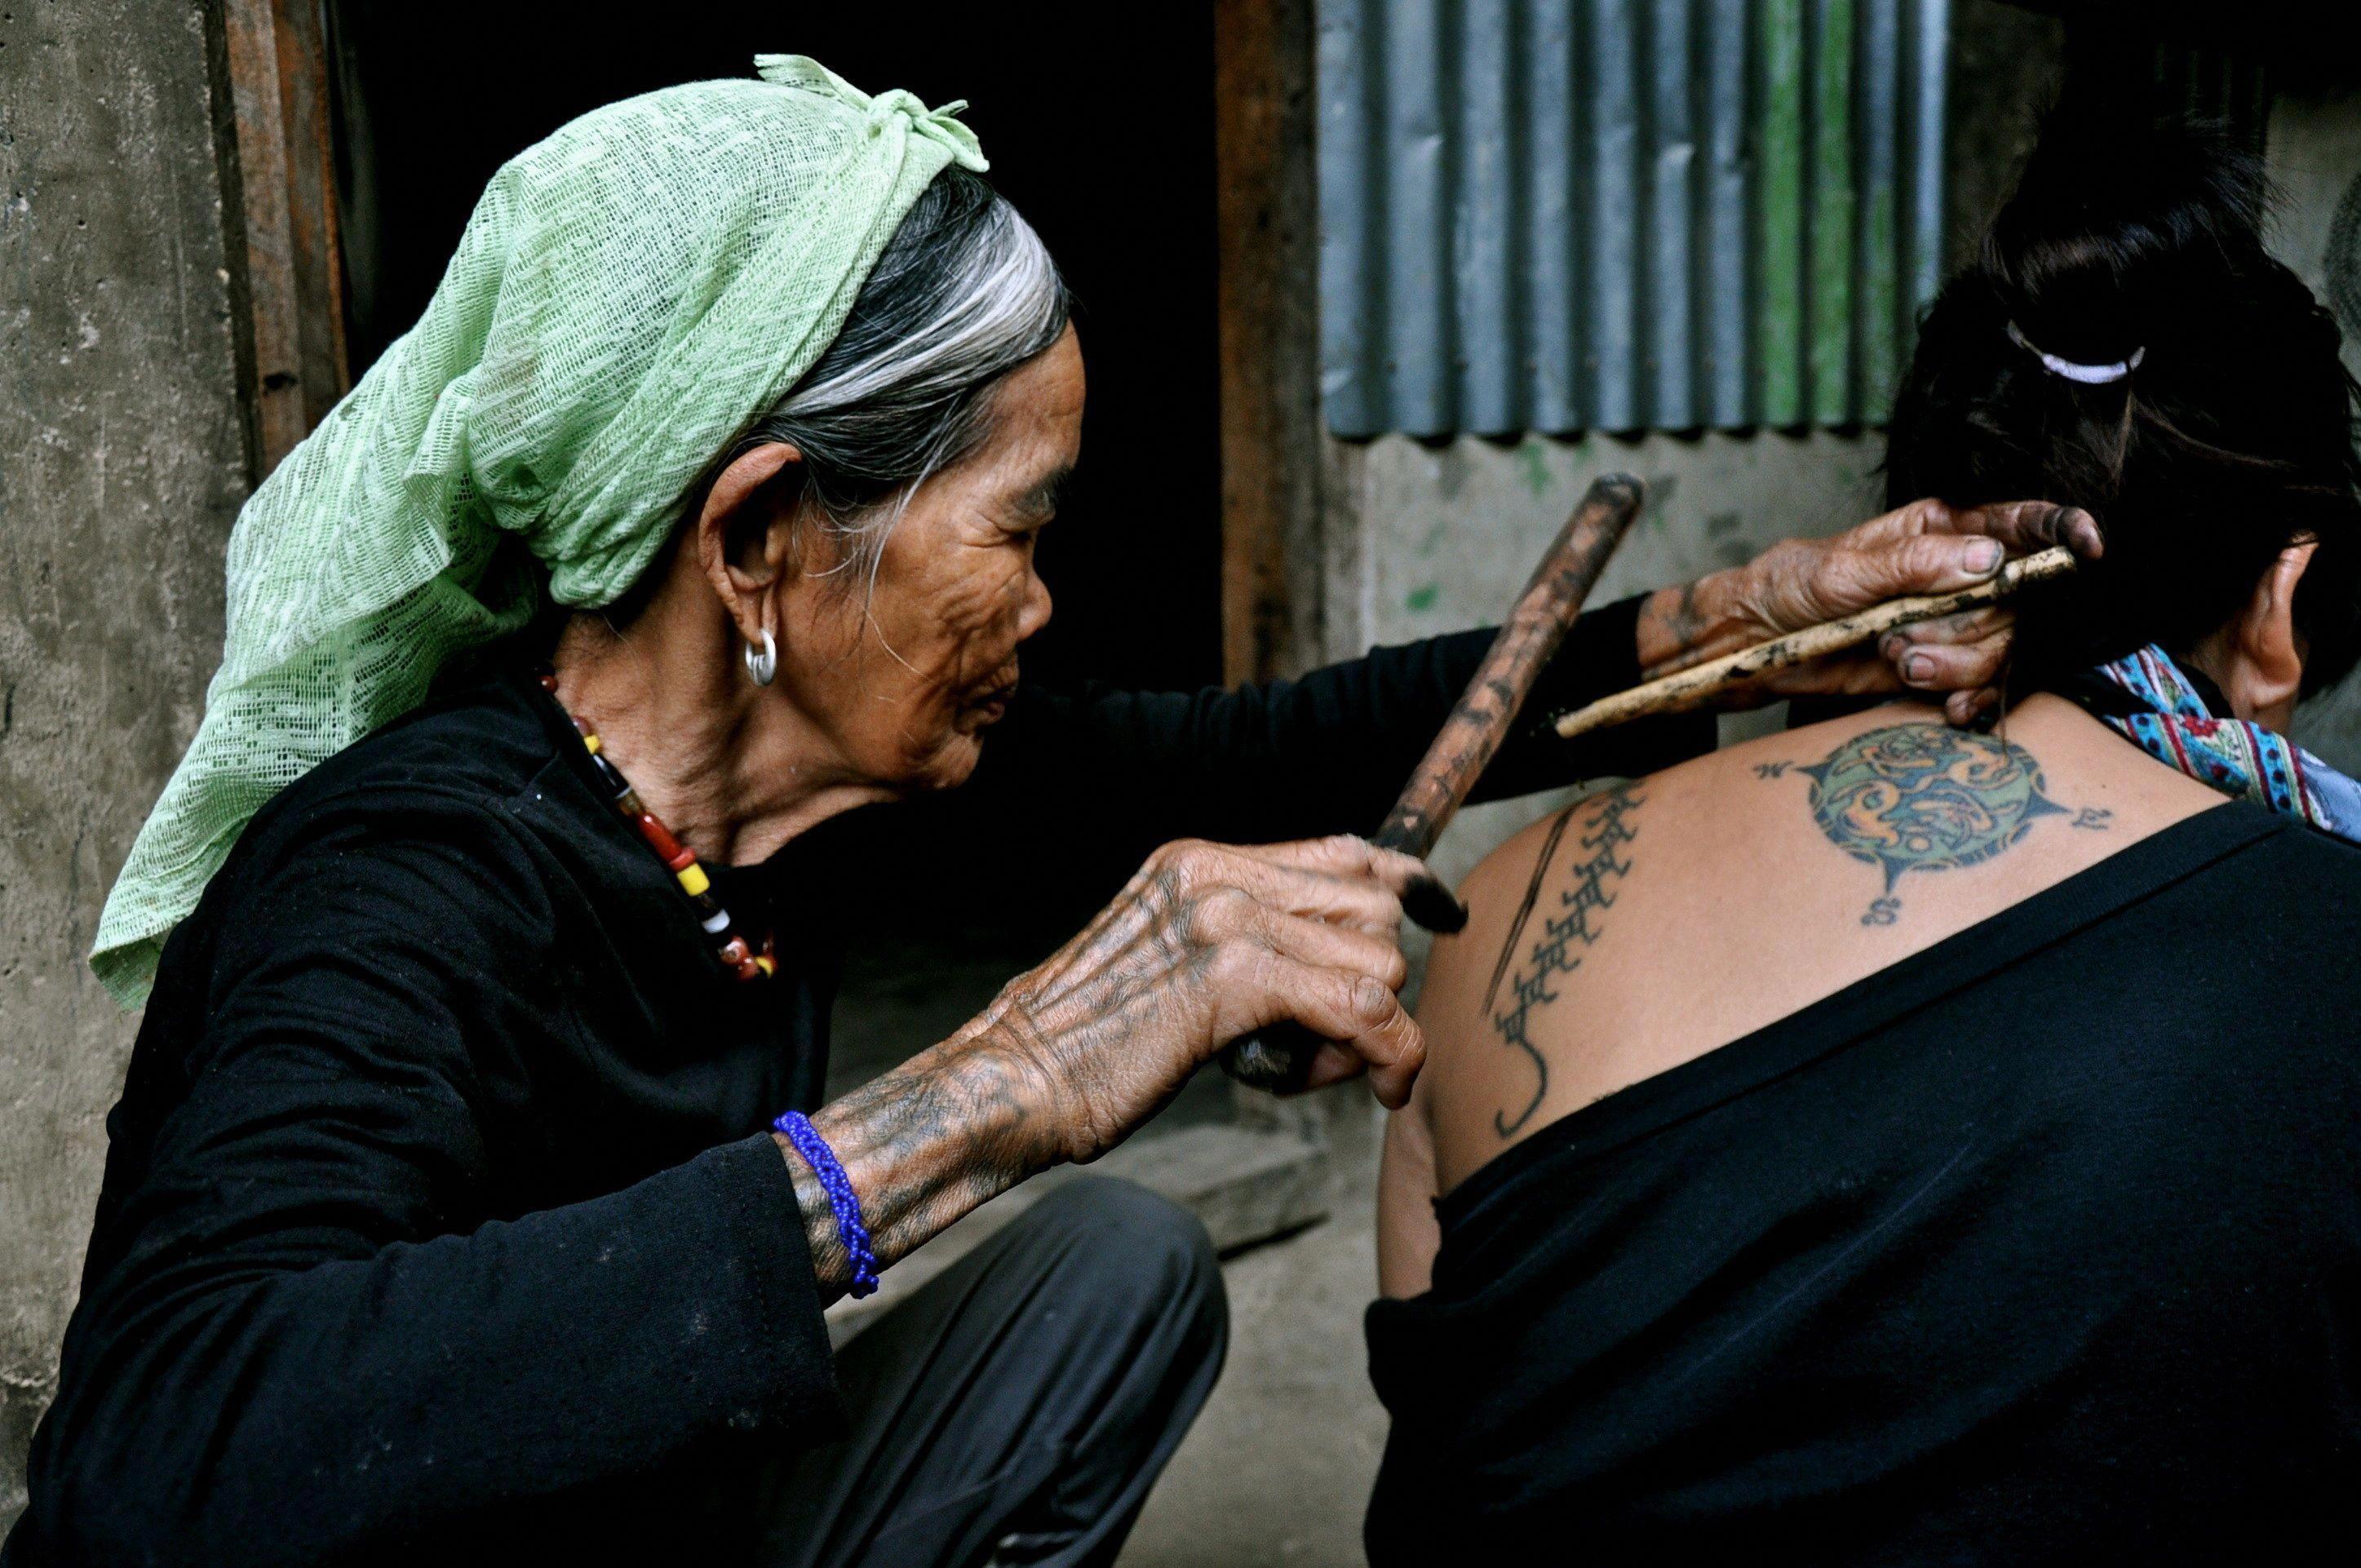 filipino tattoos artist #Tattoosonneck #Filipinotattoos